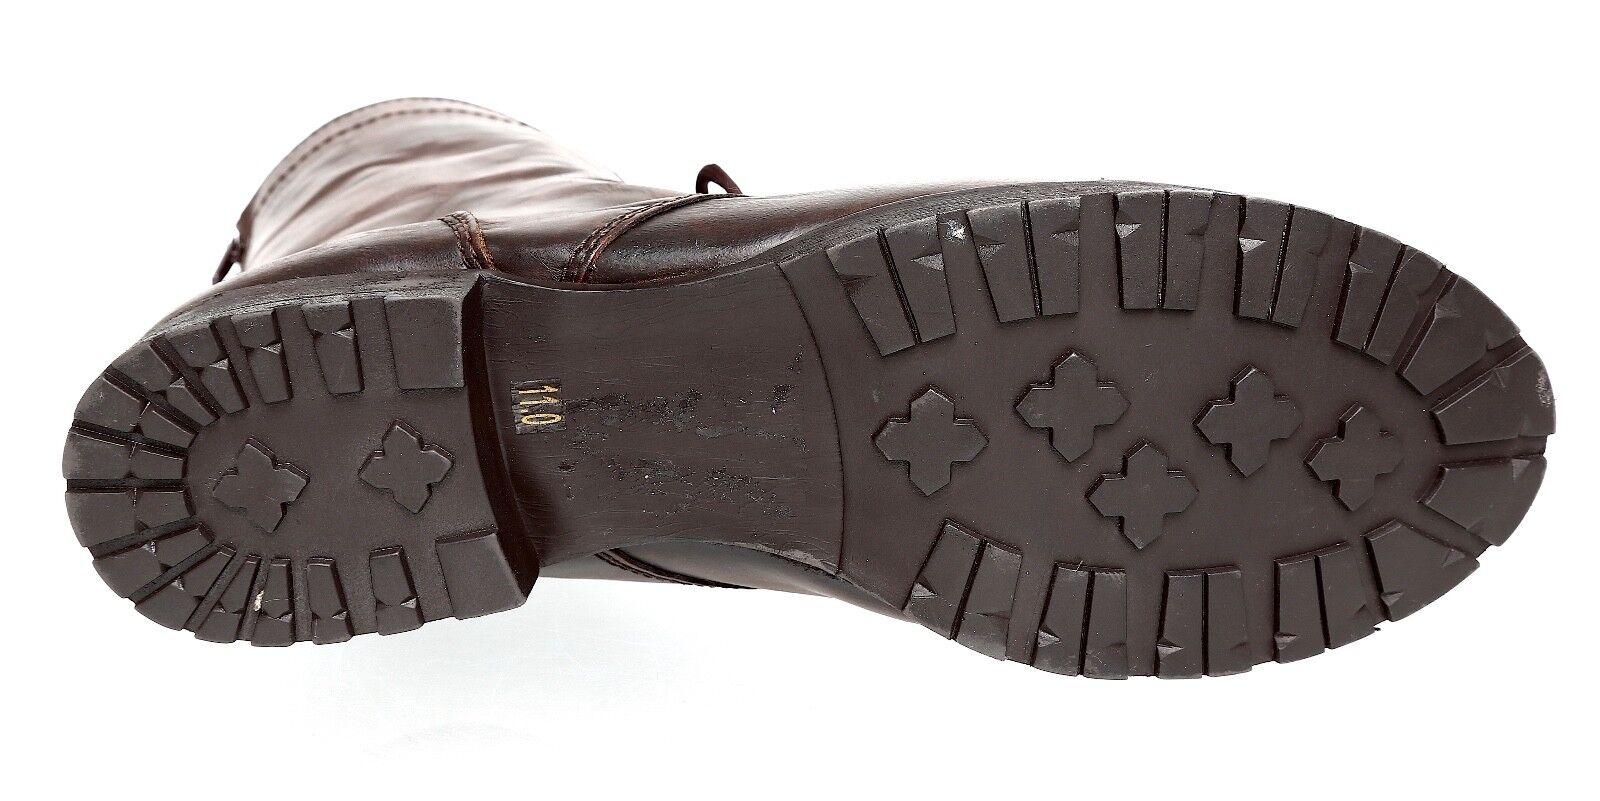 Steve Madden Snider Snider Snider Leather Stiefel braun damen Sz 11 M 5945  78032f